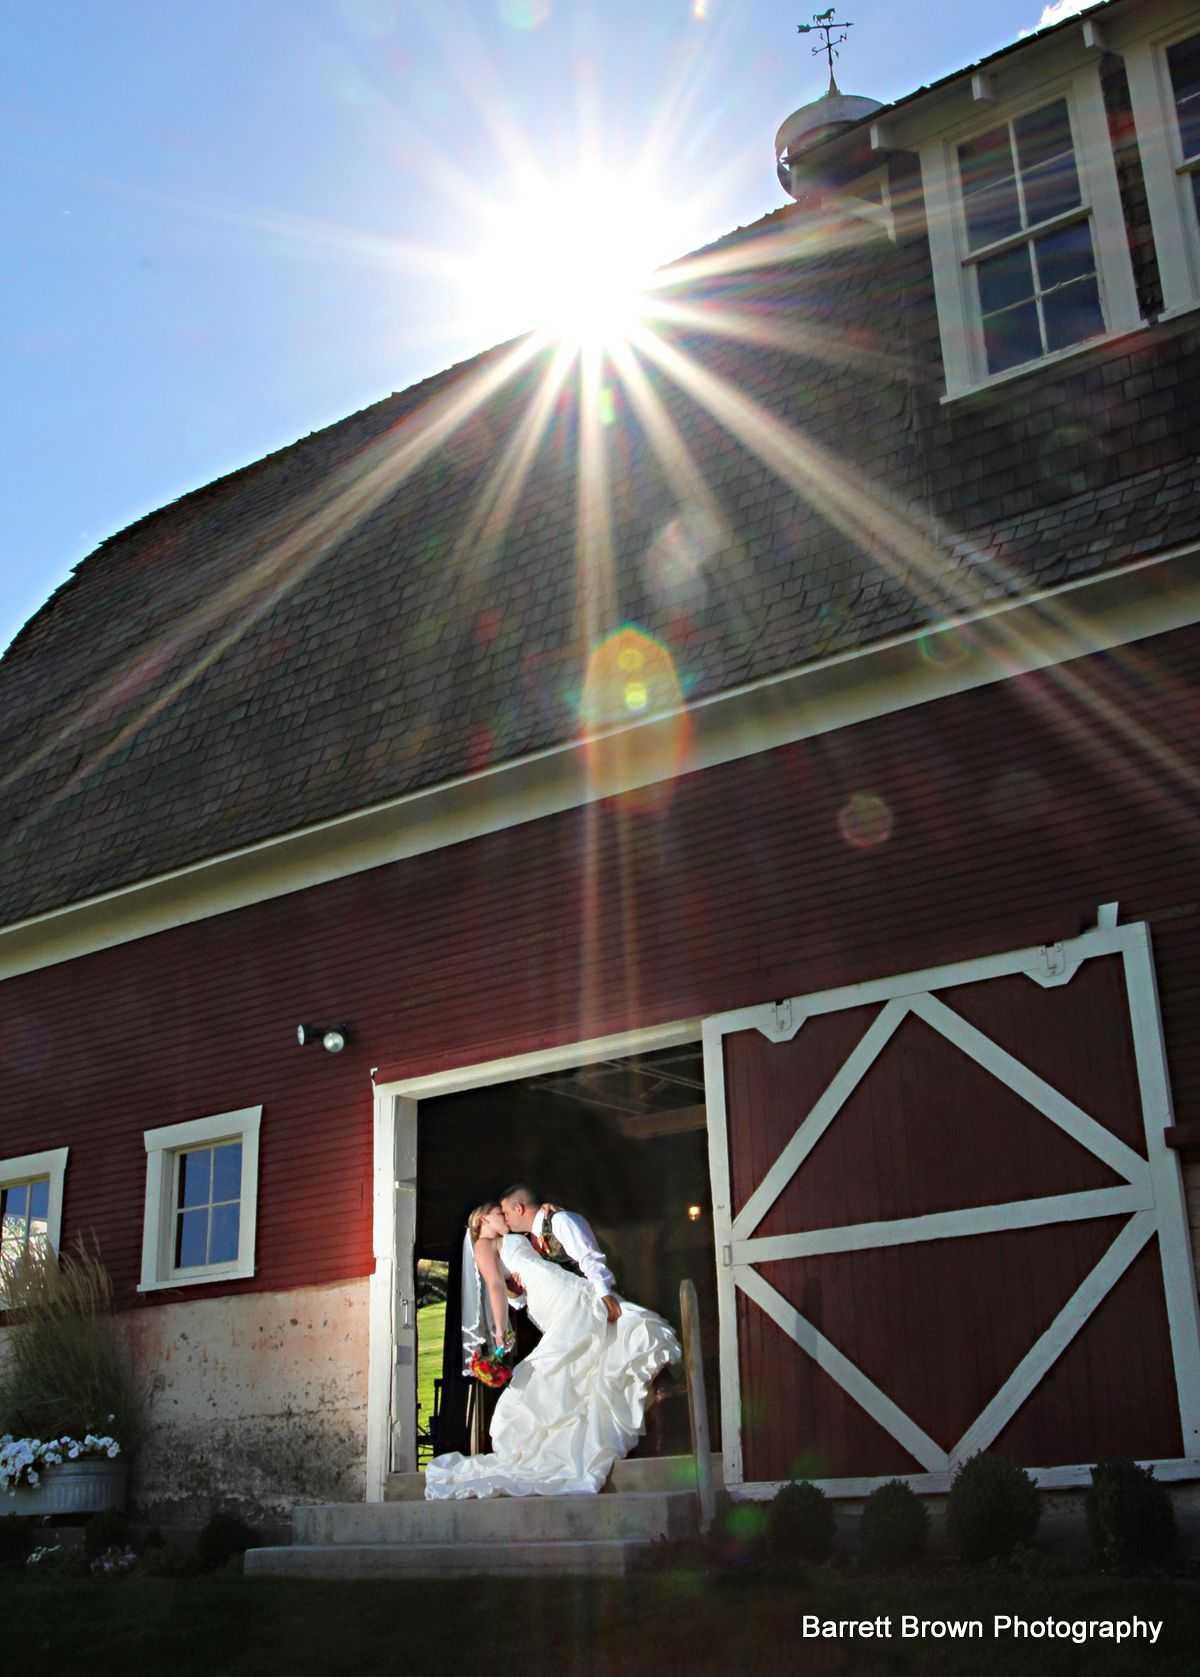 Groom dipping his bride as the couple kiss at the center of an open bar door, the sun peeking over